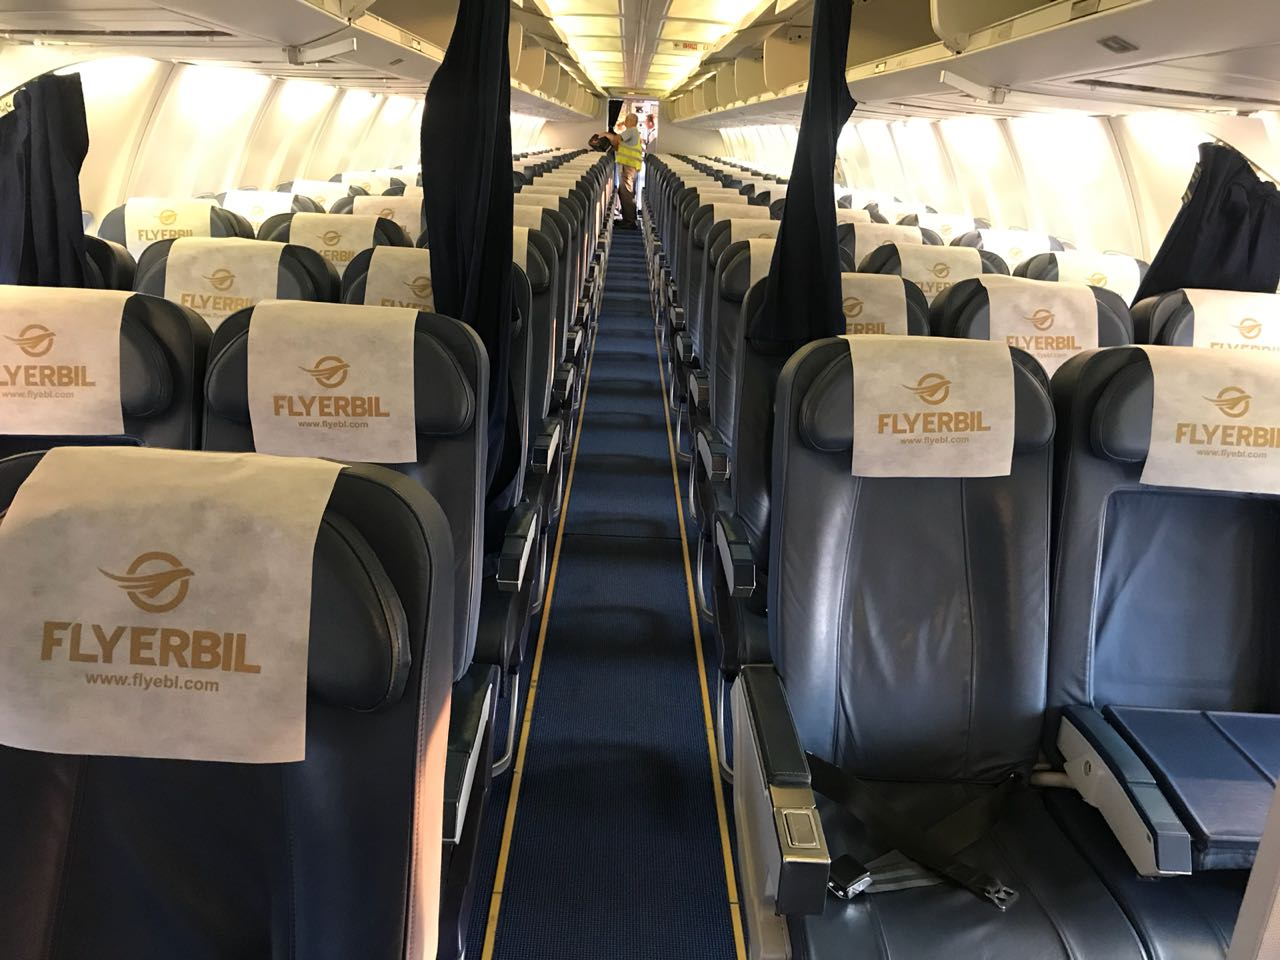 Inside Fly Erbil's 737 (Image: Fly Erbil)